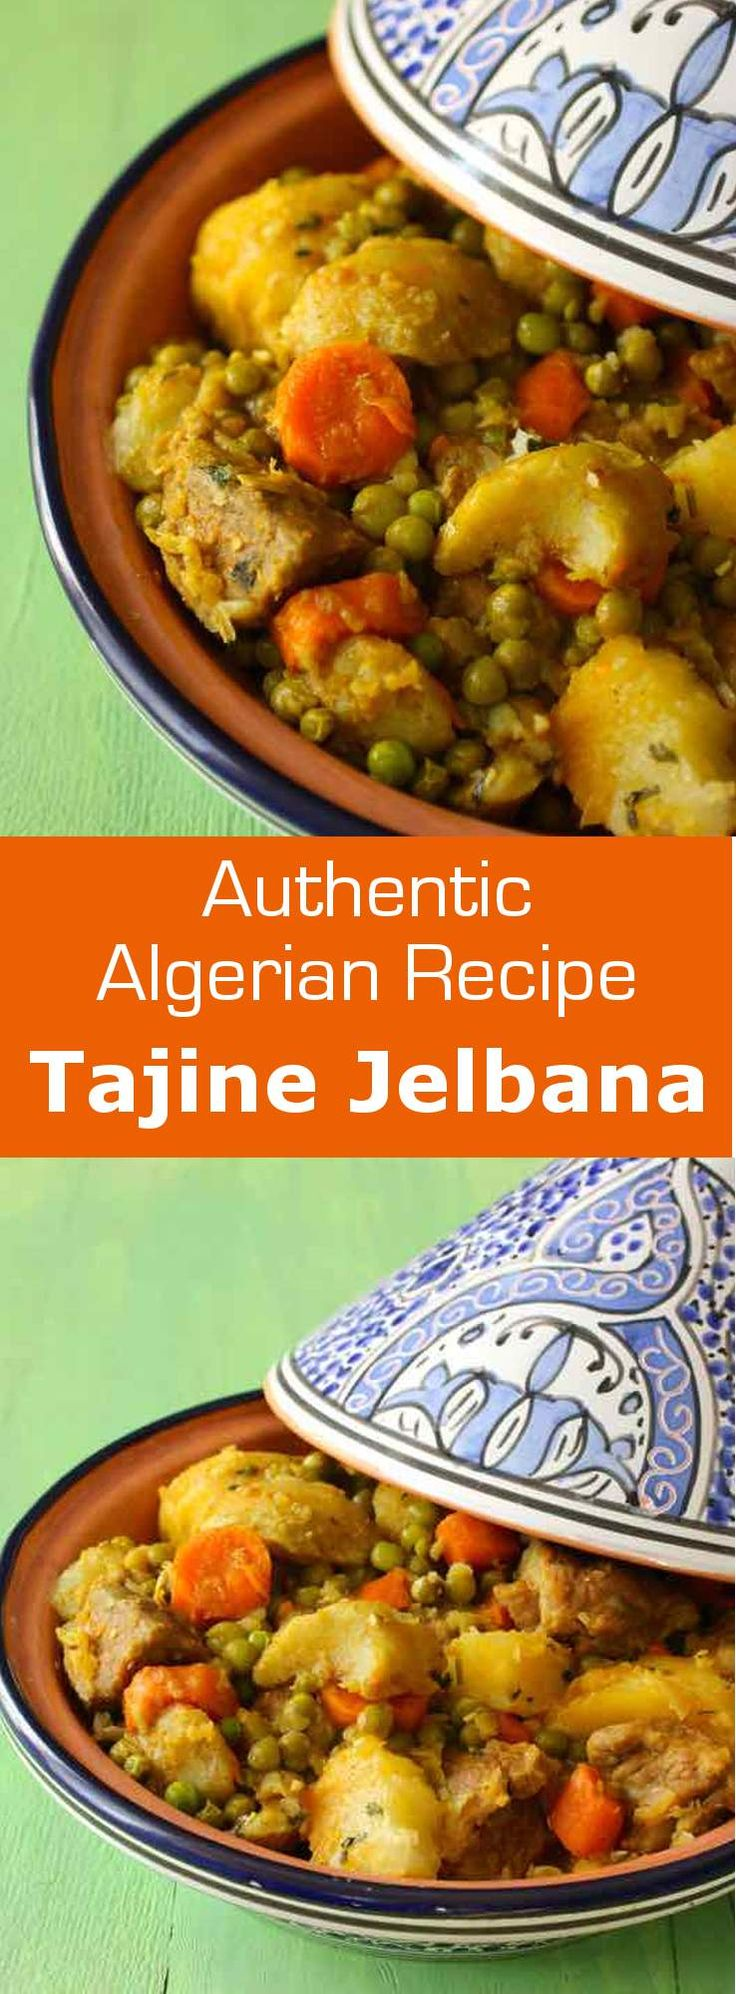 Tajine jelbana is a traditional North African meat stew prepared with peas, artichoke, potatoes and carrots. #algeria #tunisia #maghreb…